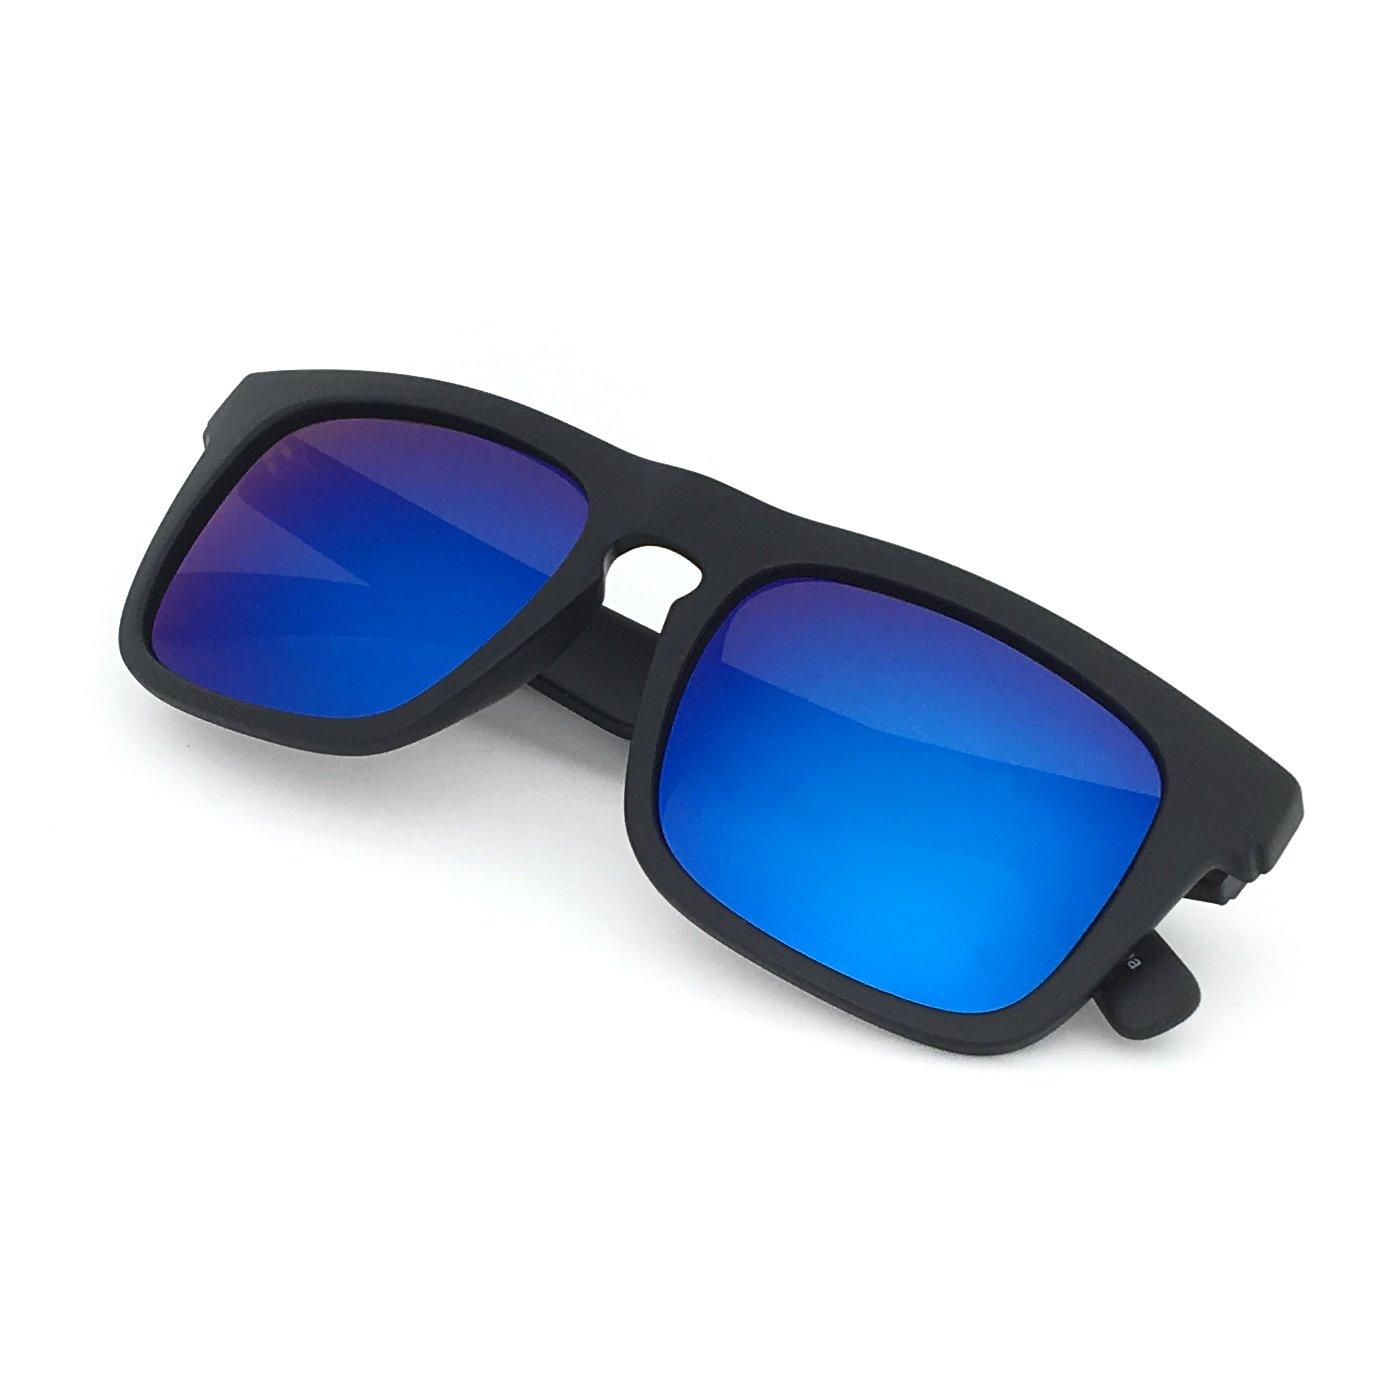 3e75b91bf4 Amazon.com  J+S Raglan Surfer s Choice Flash Mirror Lens Standard Fit  Square Matte Finish Polarized 400UV Sunglasses for Men (Blue Mirror Lens)   Sports   ...